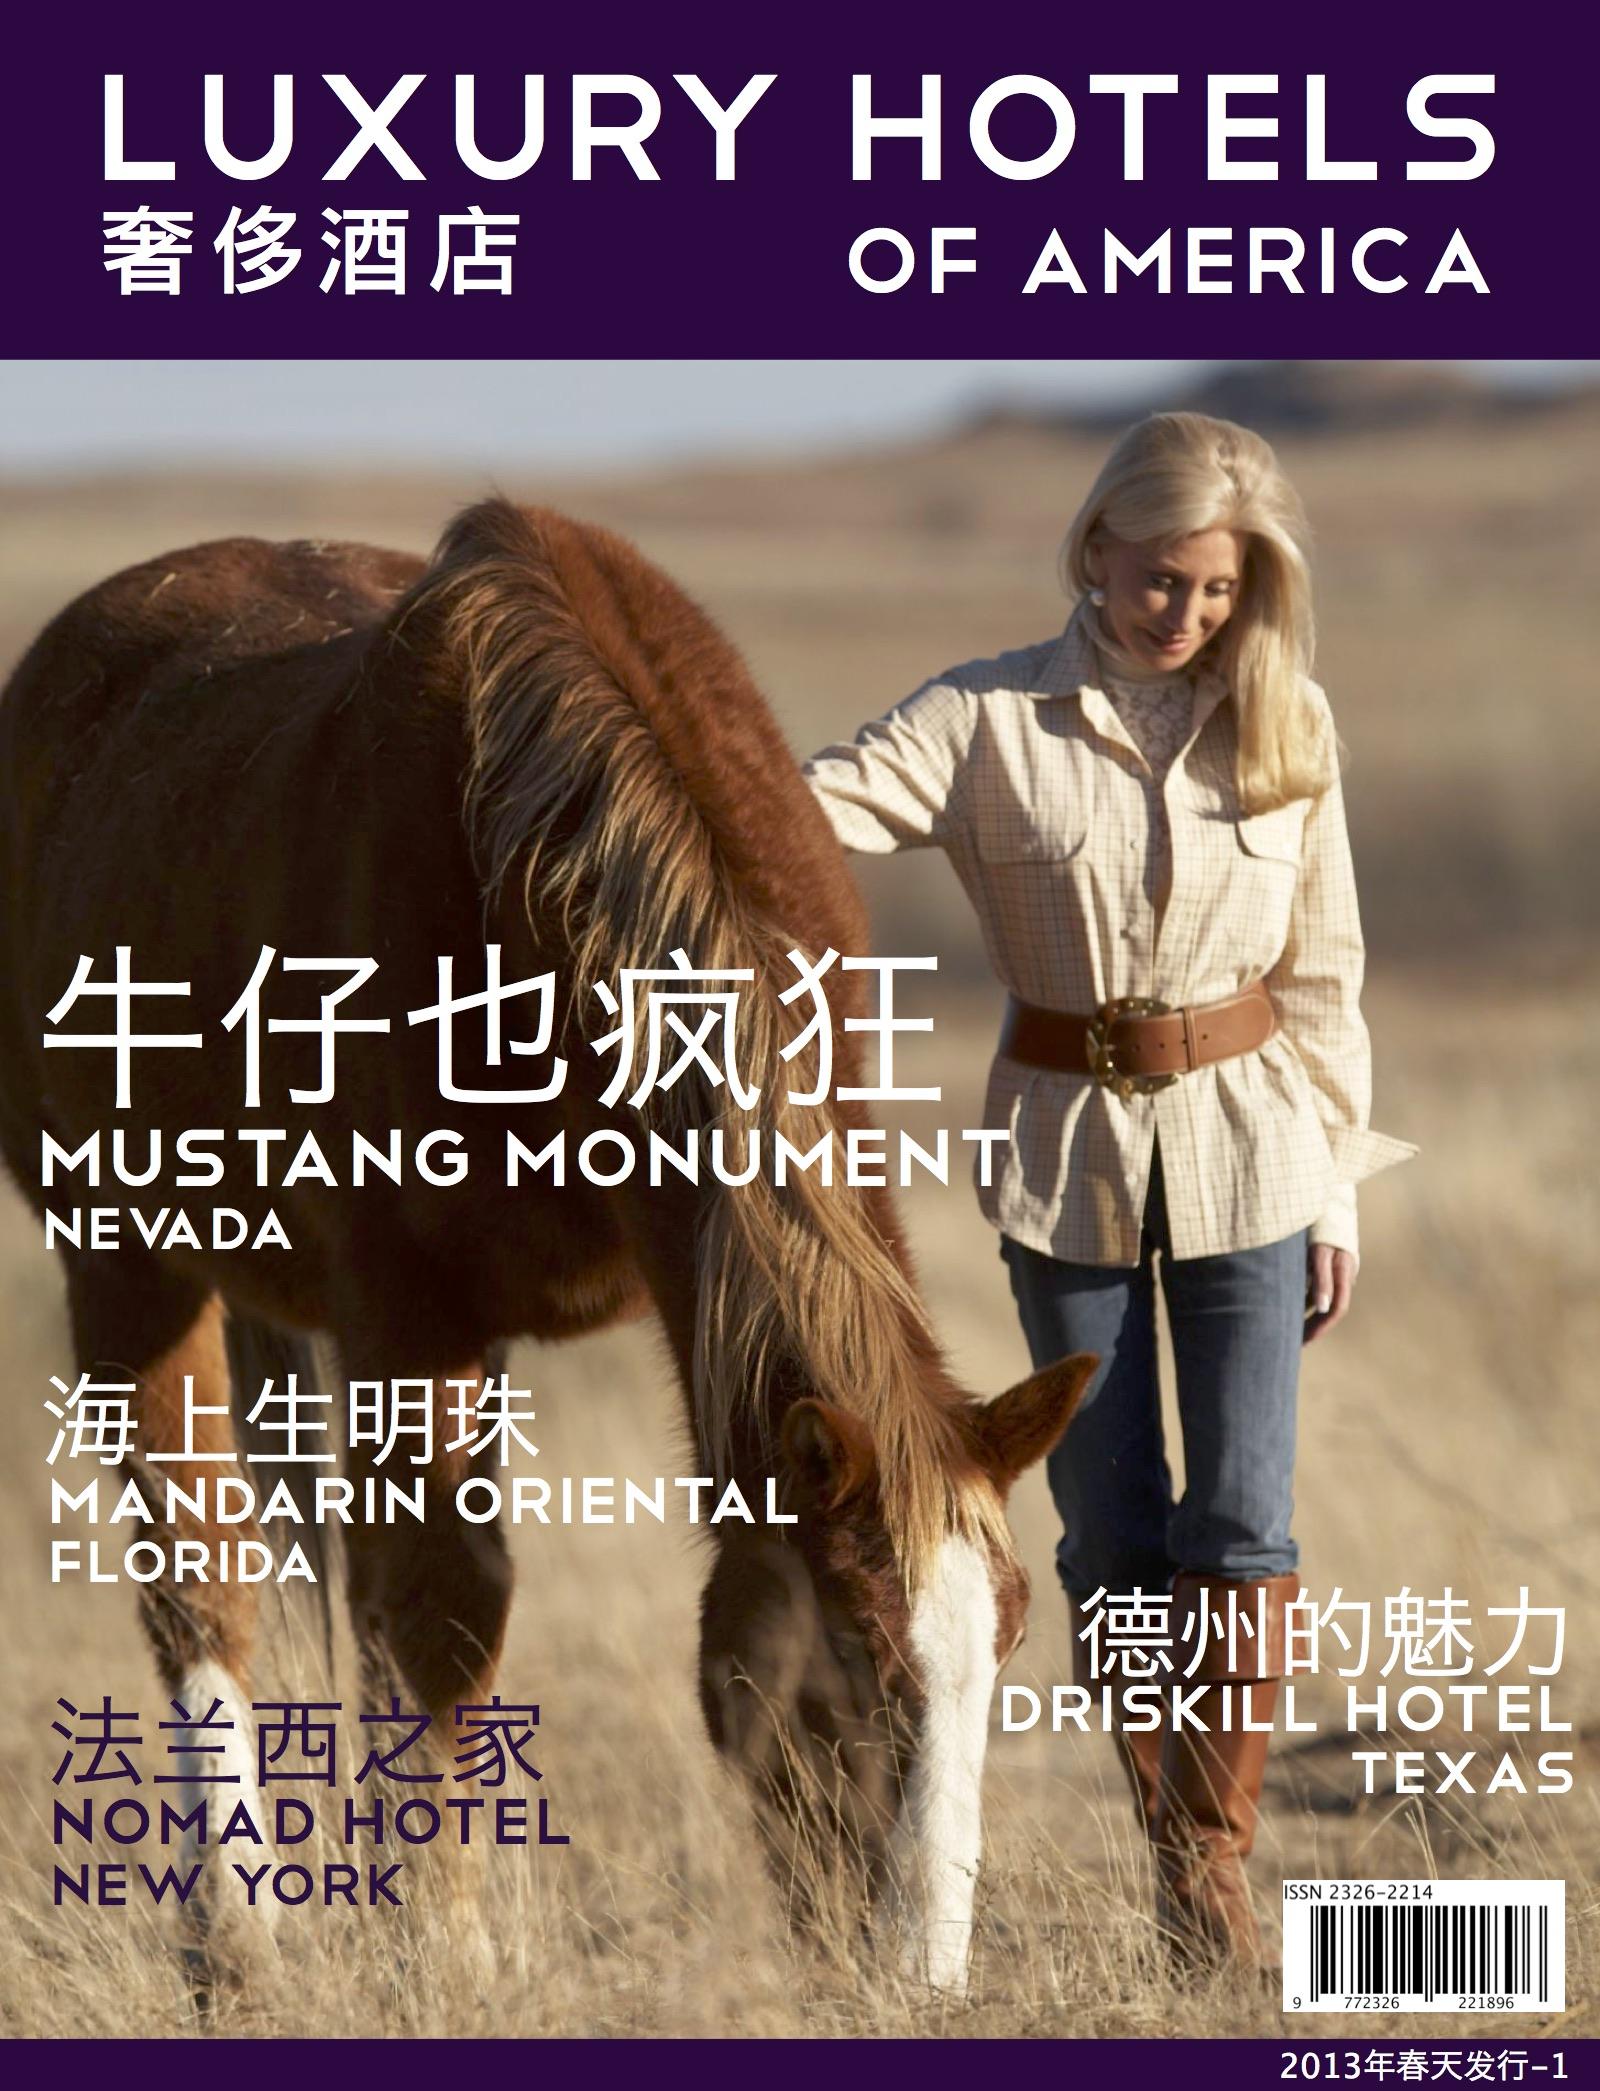 Luxury Hotels of America Spring 2013 - Mustang Monument - Legit Productions.jpg